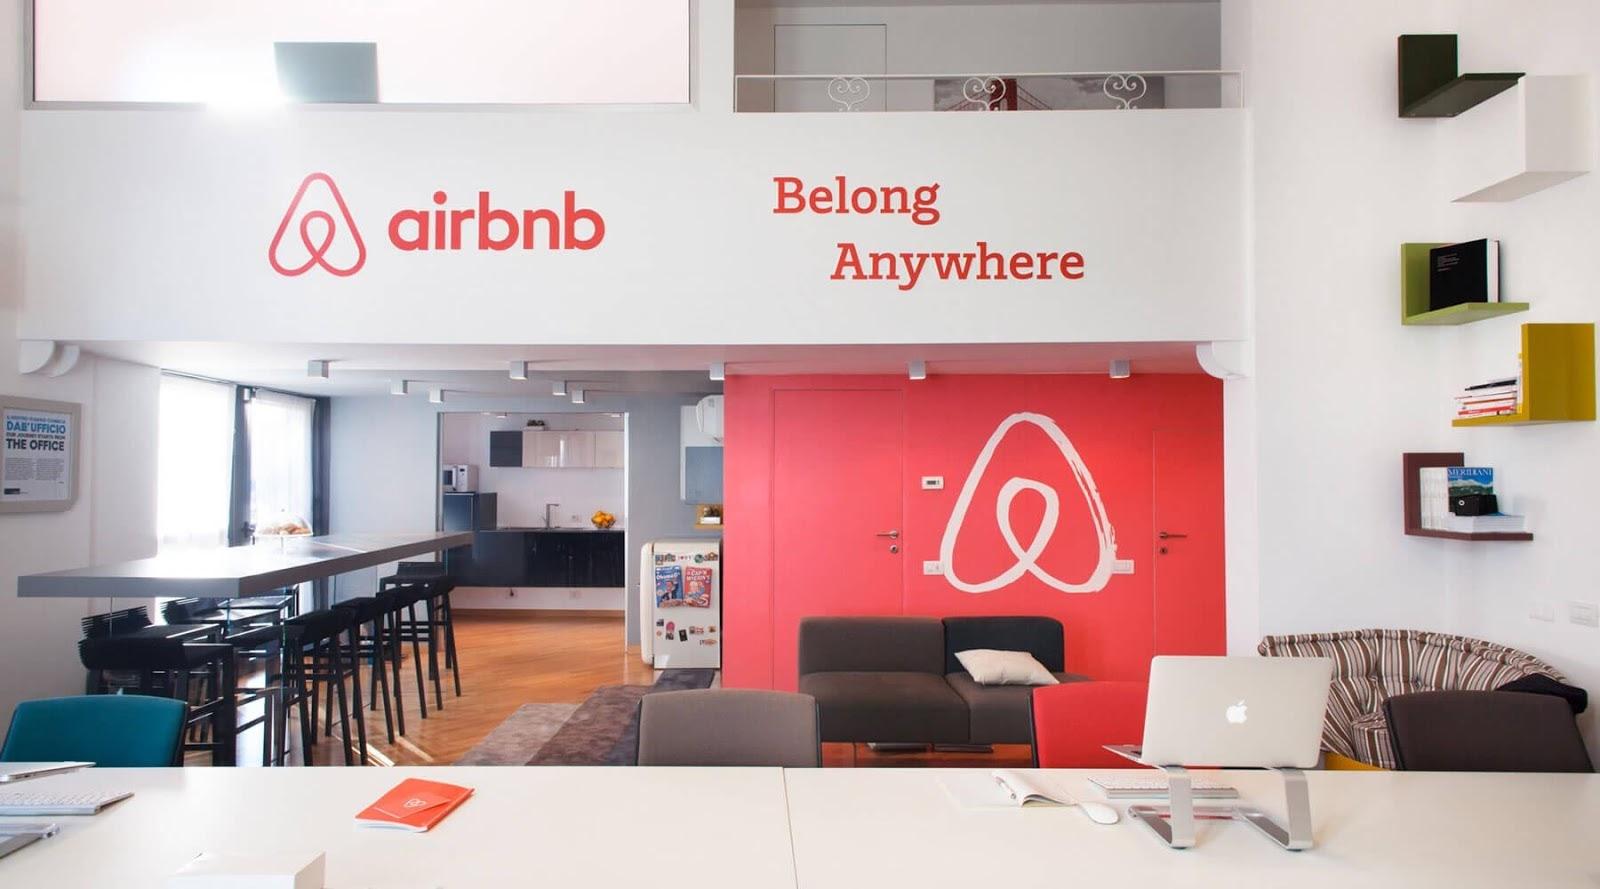 Airbnb's startup brand